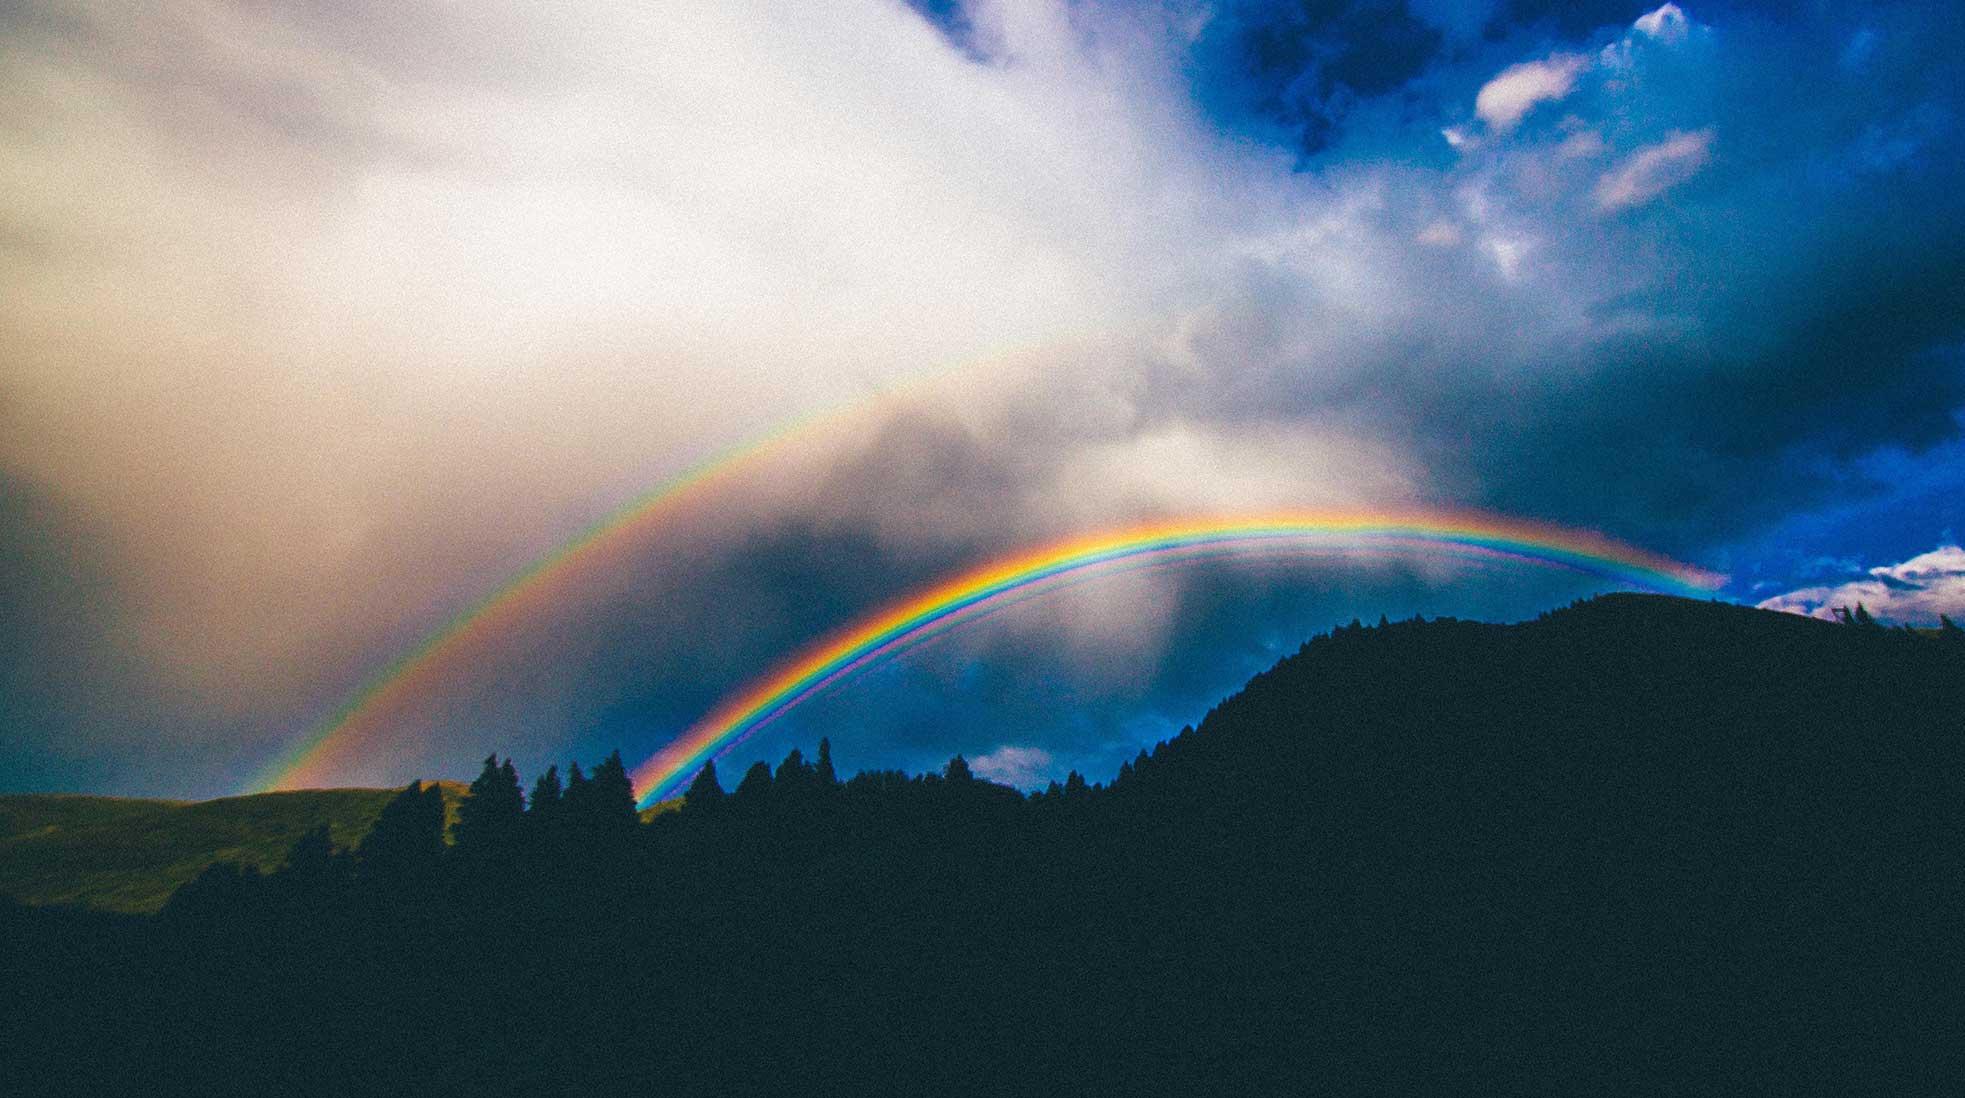 Double rainbow, cloudy skies